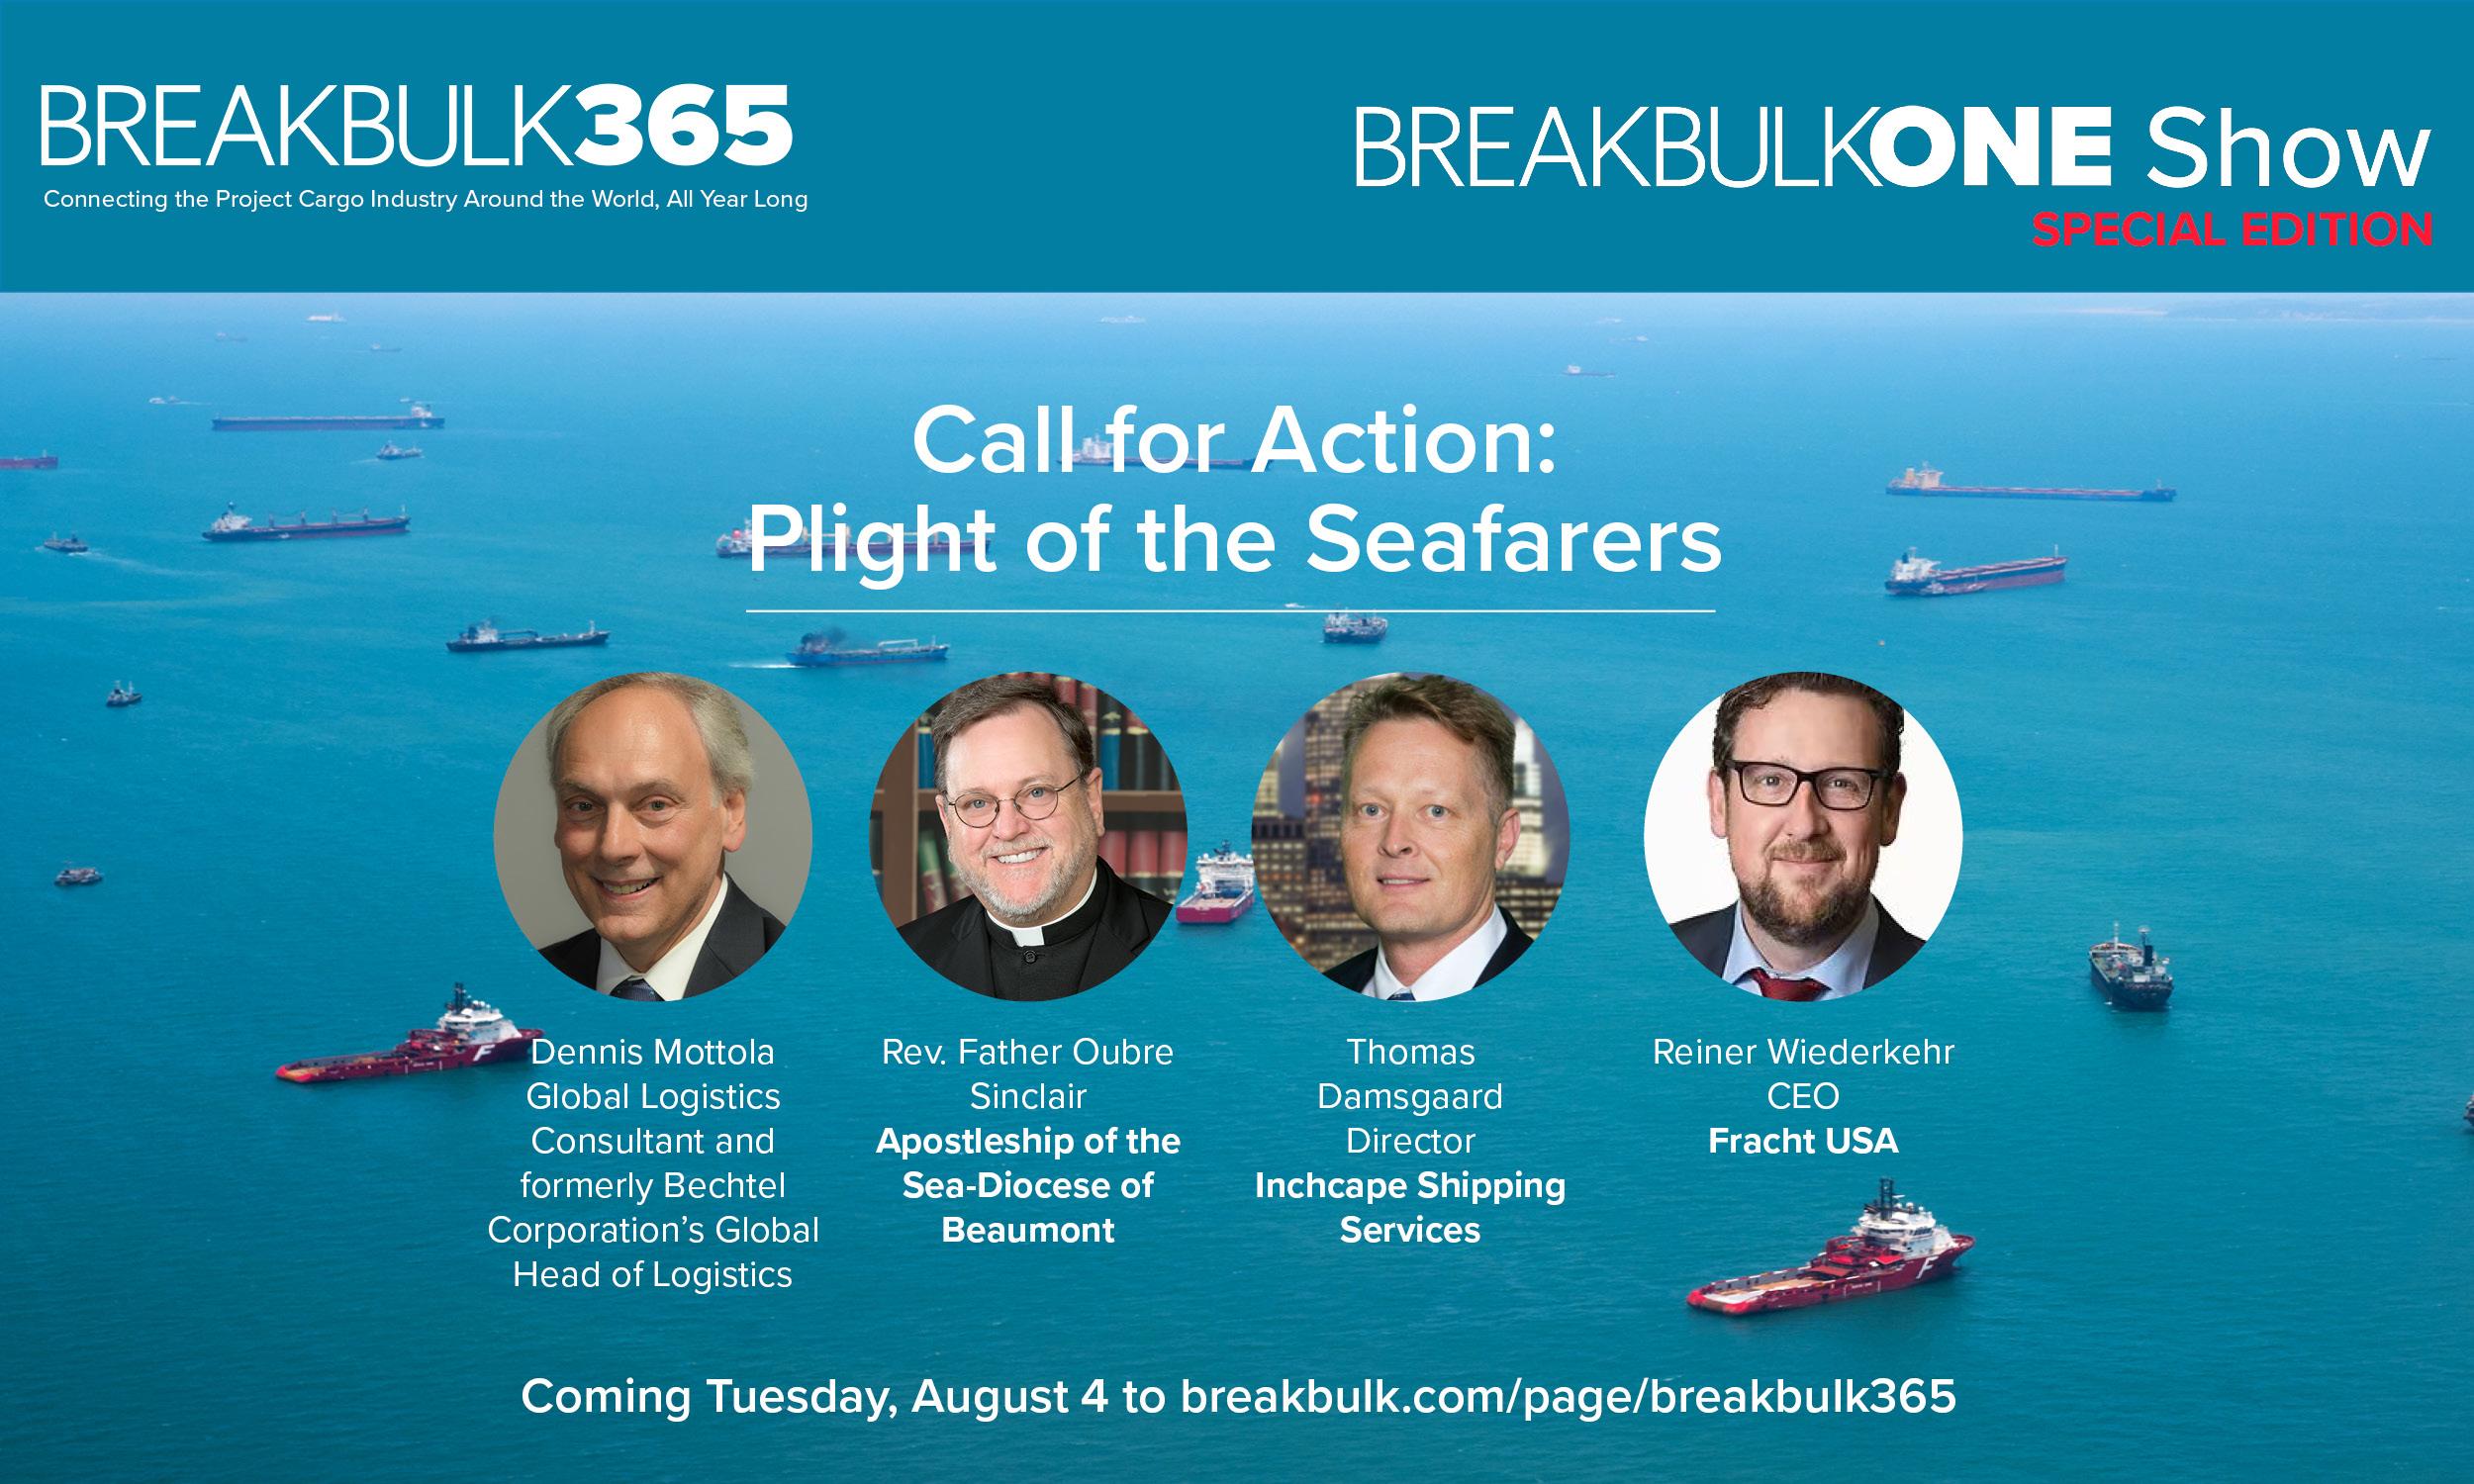 BreakbulkONE Special Edition on Seafarer Relief